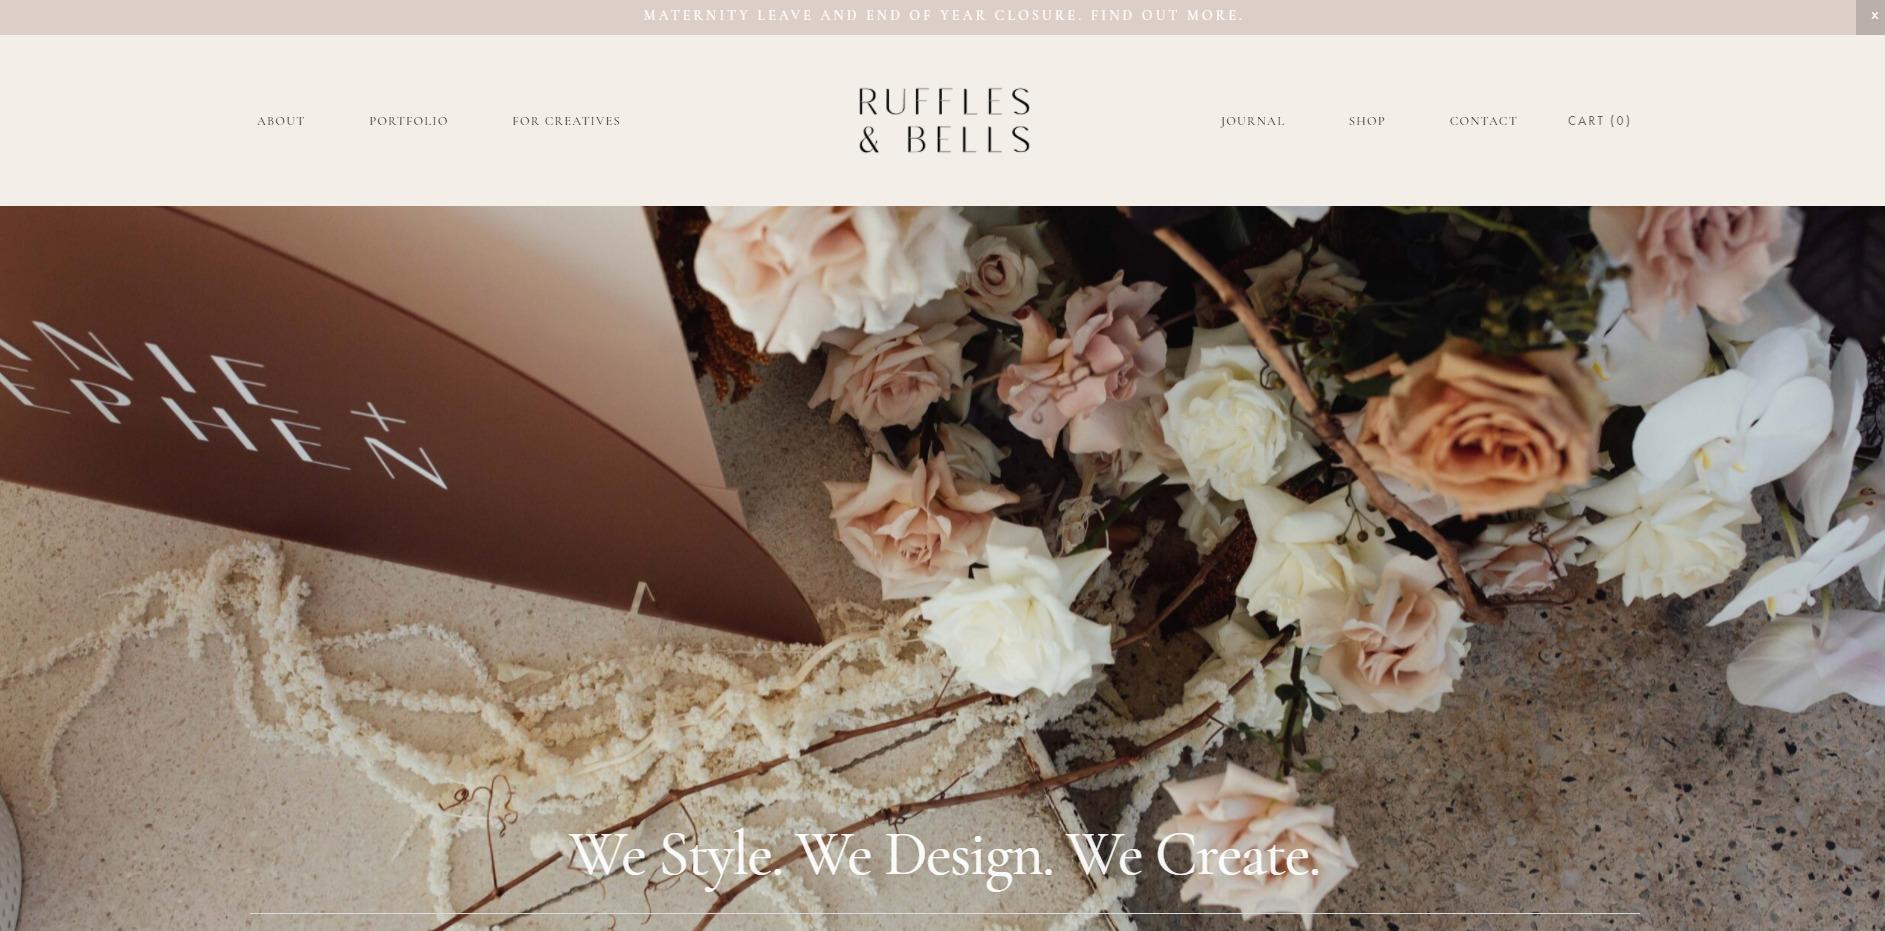 Ruffles And Bells